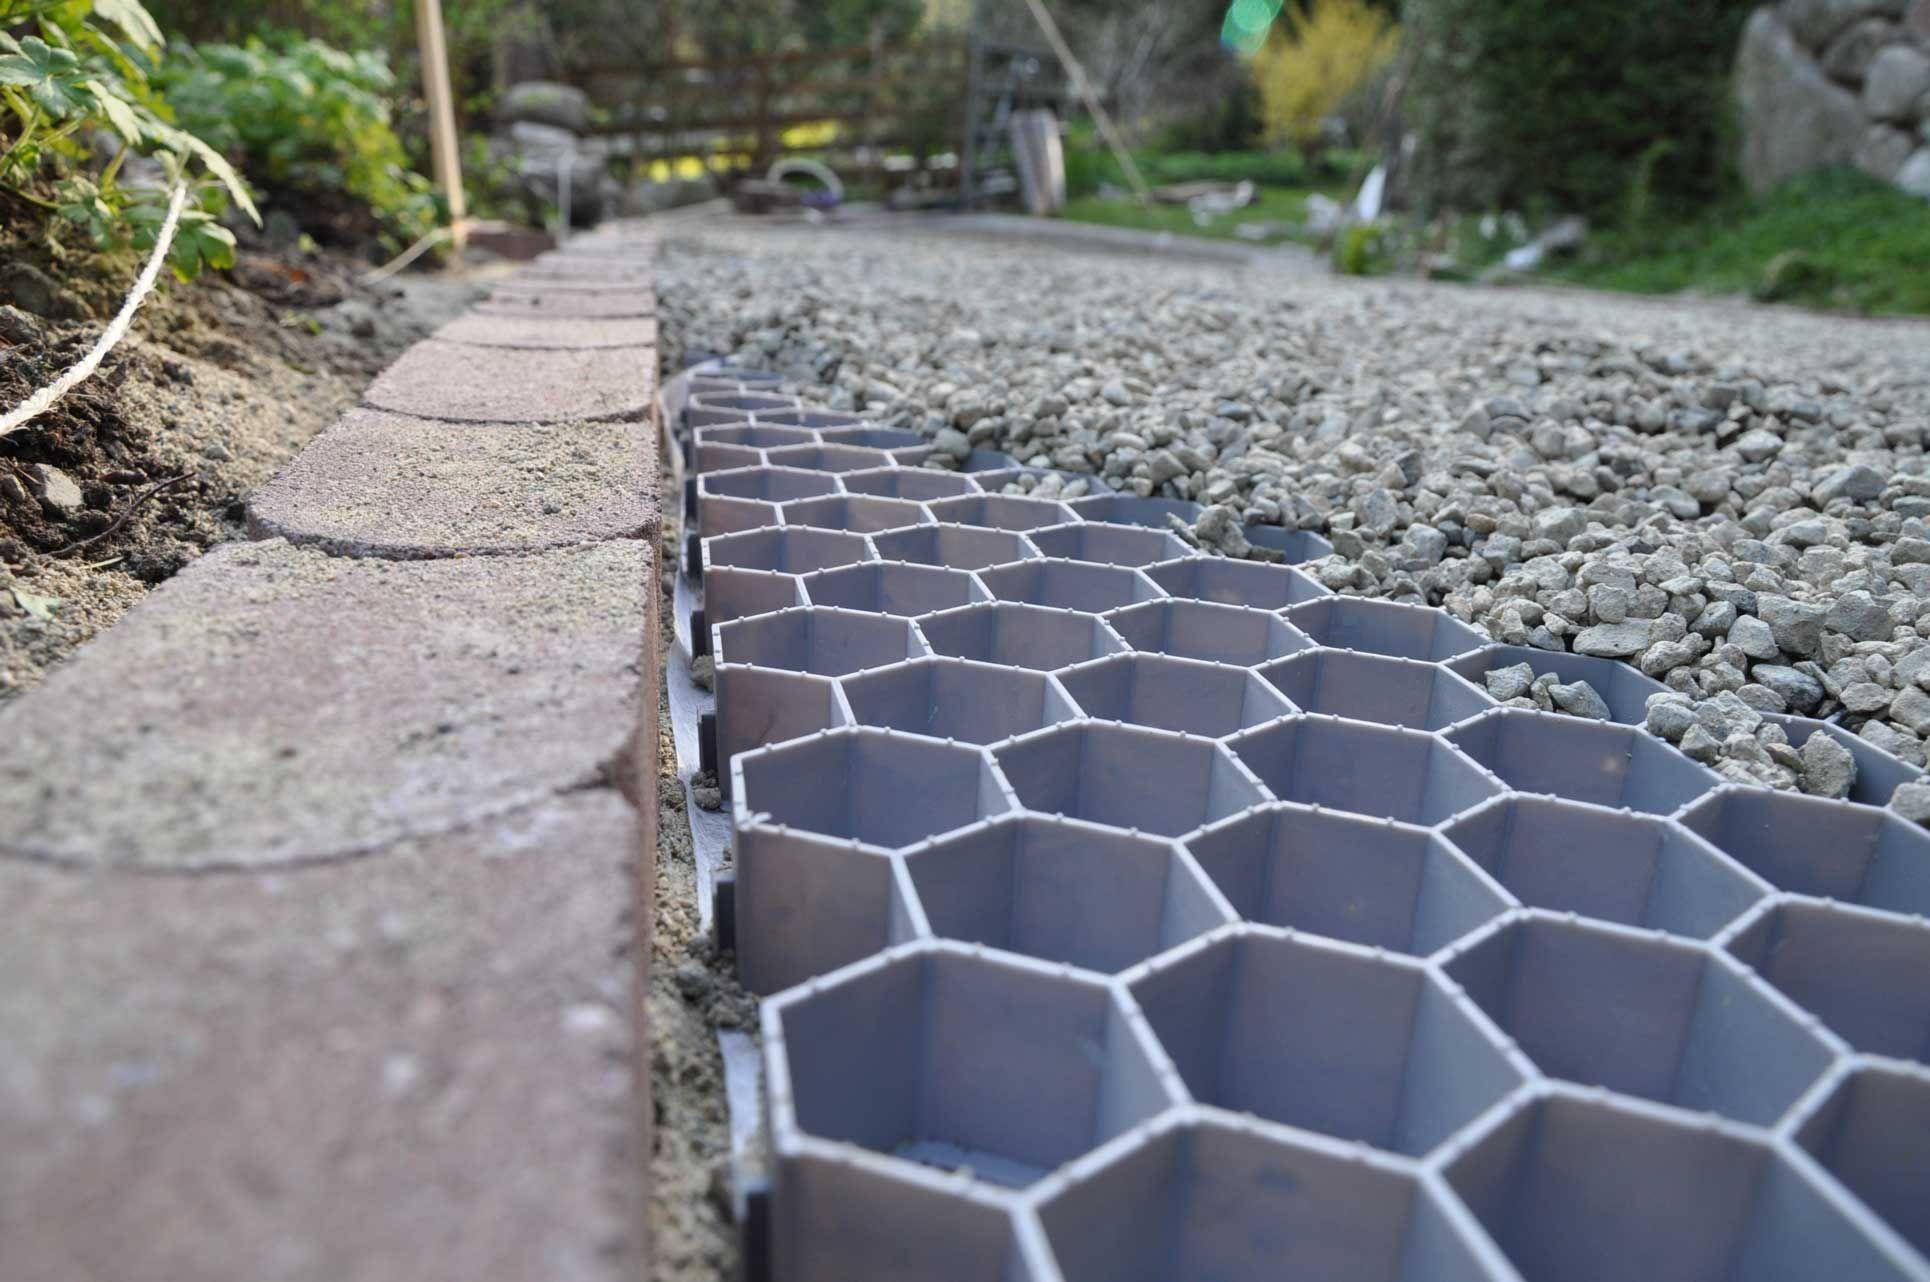 Gravel driveway driveway ideas pinterest - Ideas for gravel driveways ...